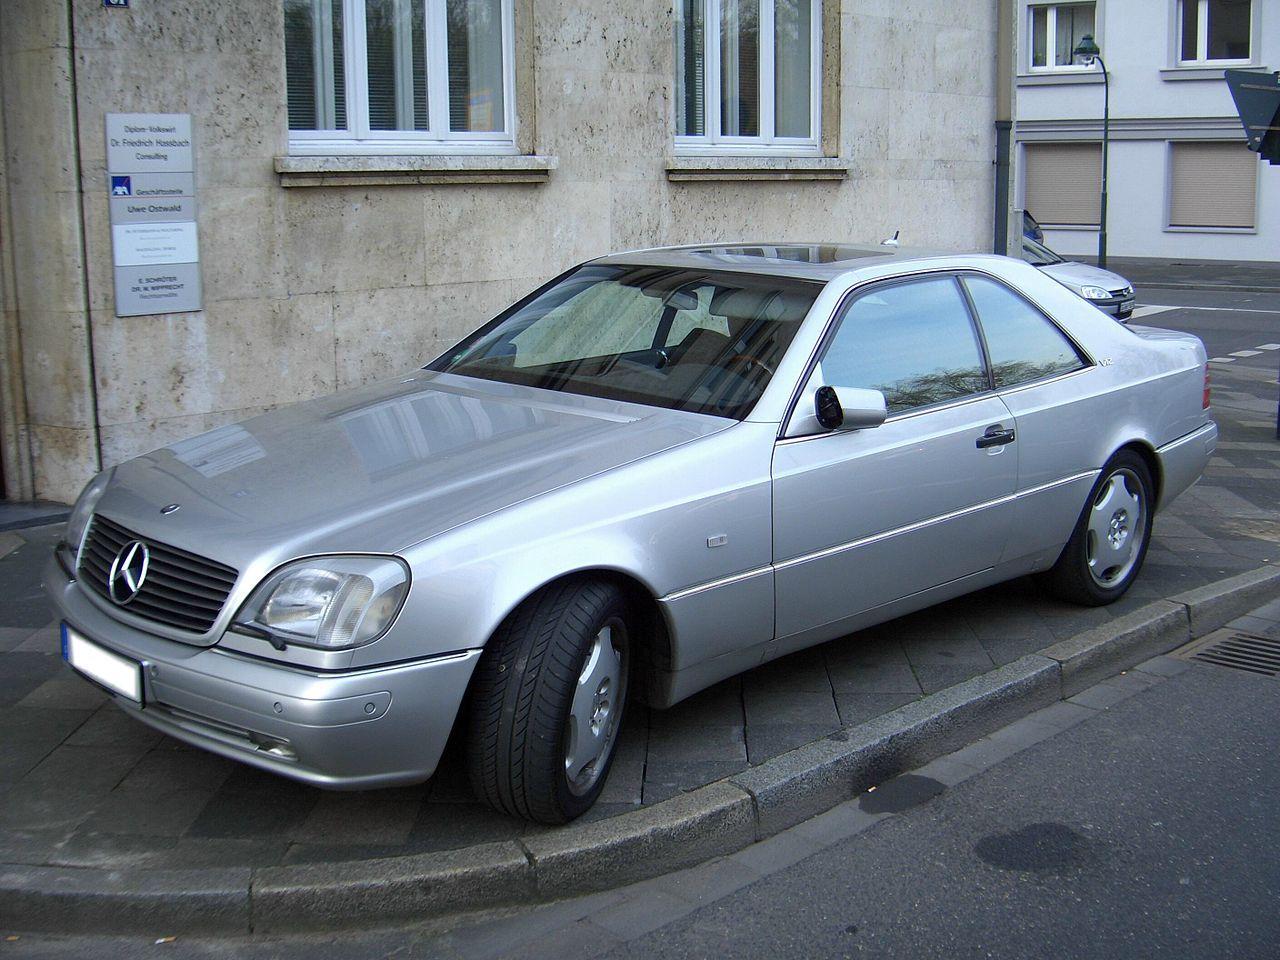 s class coupe for sale dubai